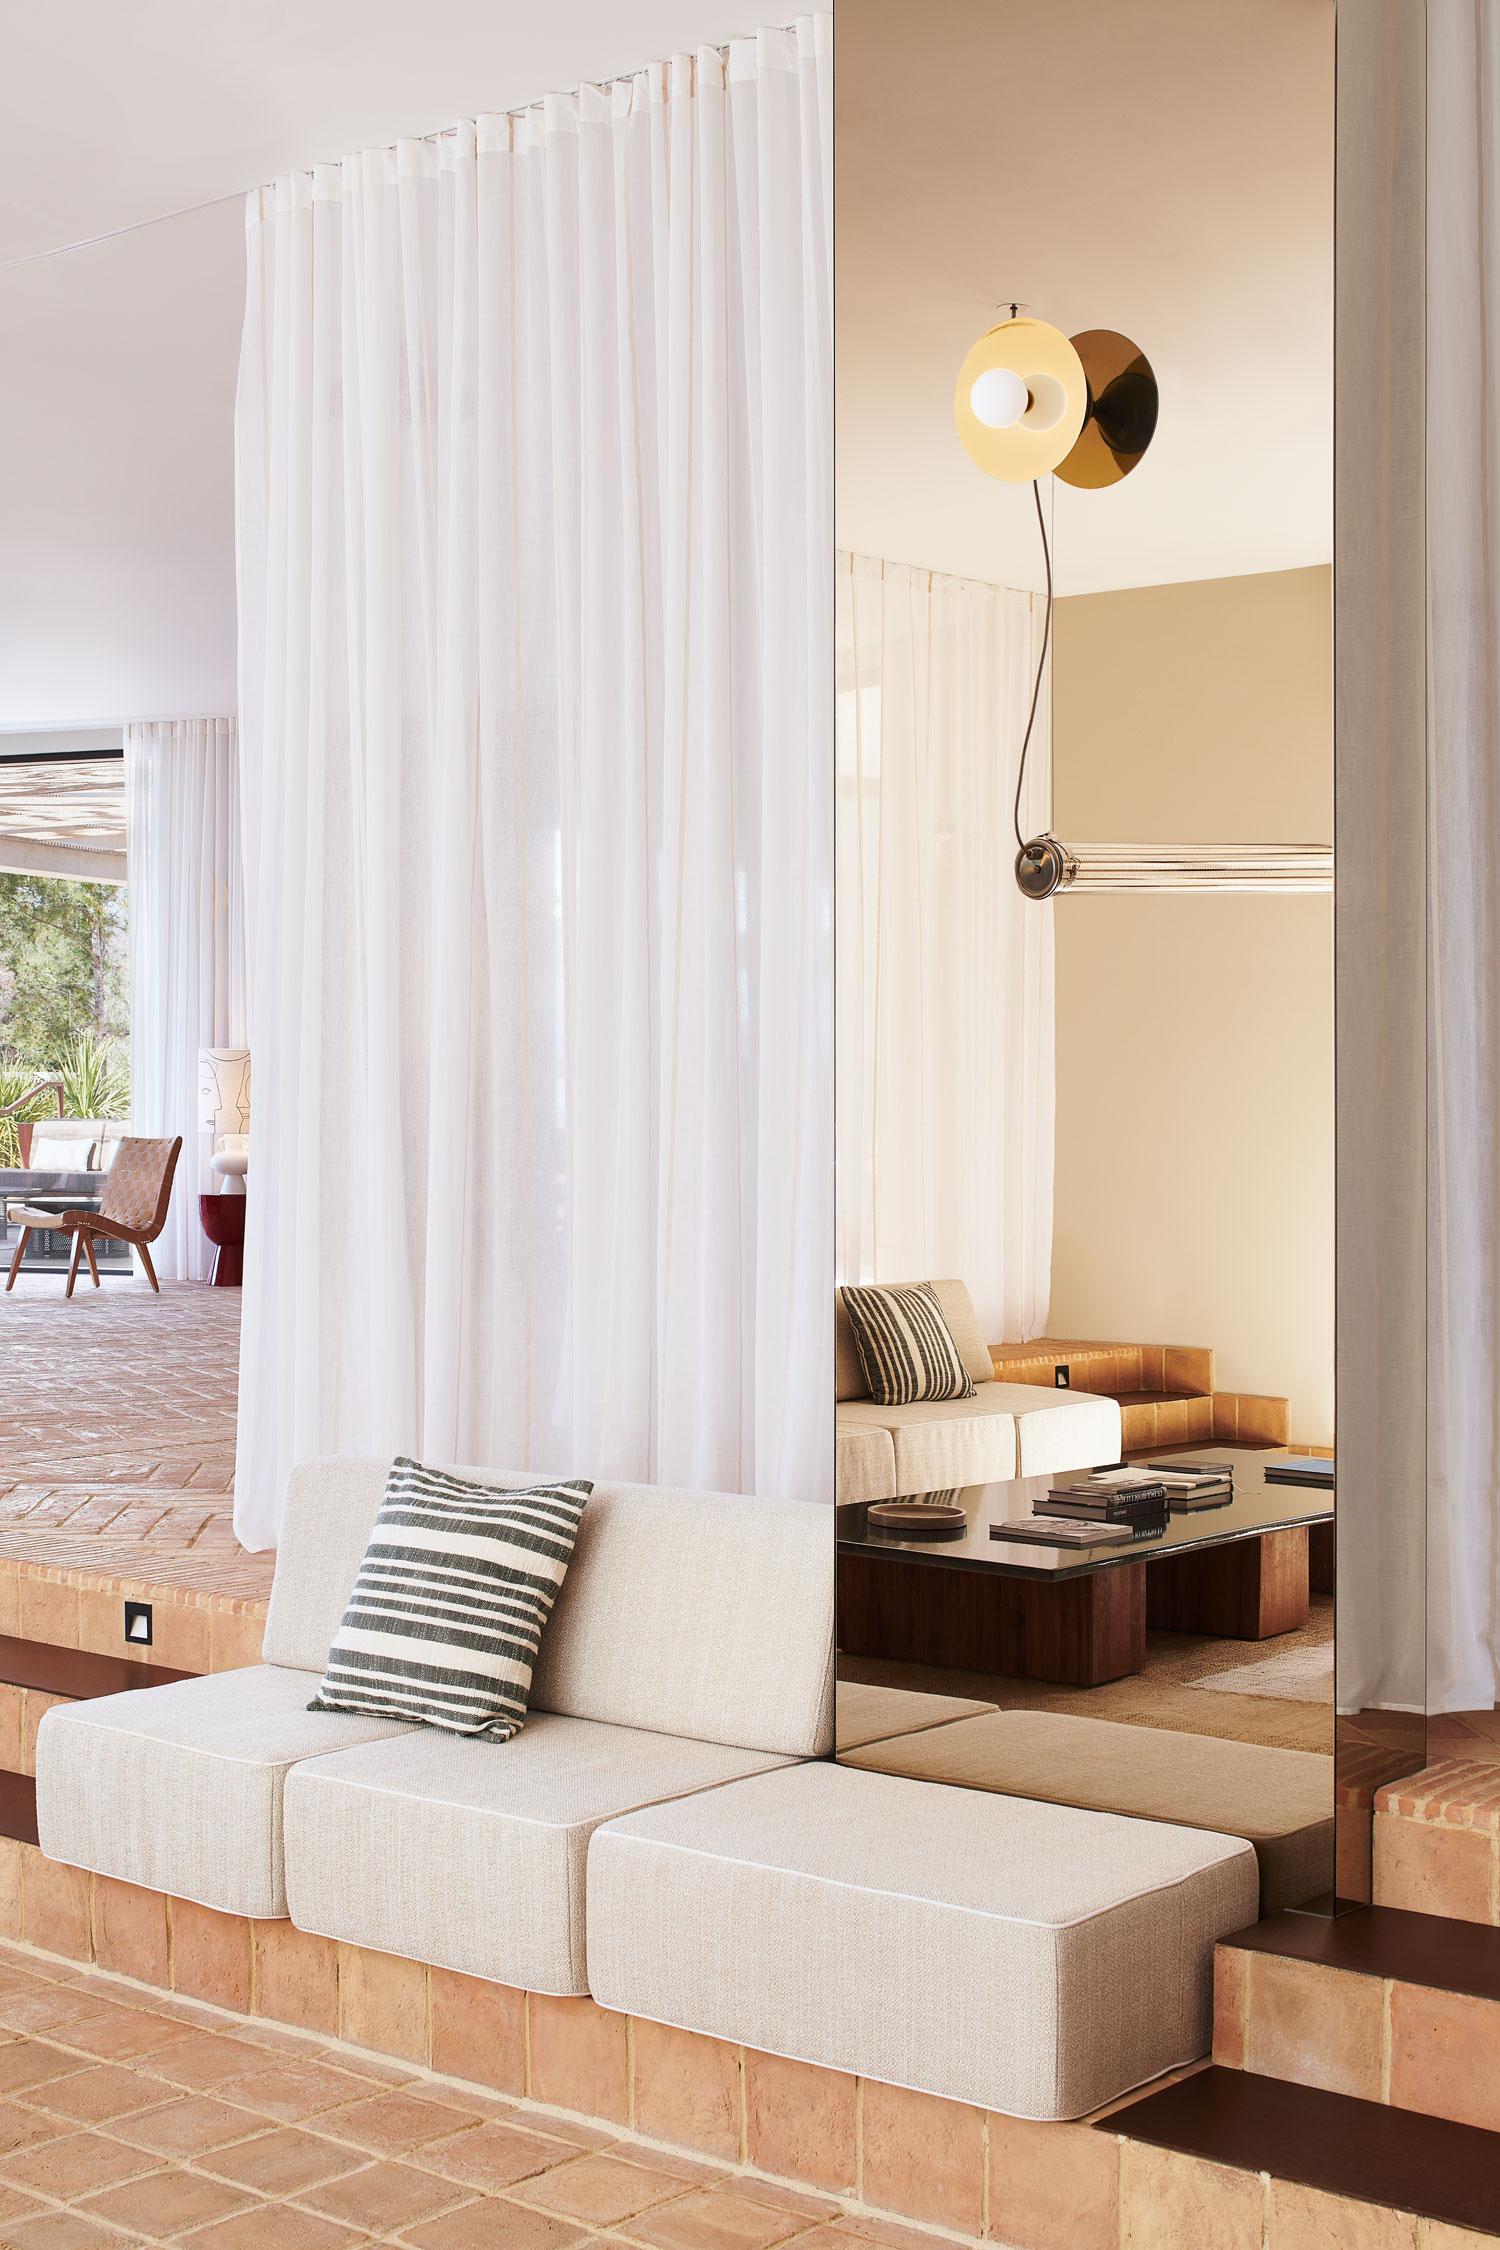 Lam Studio Hotel Maslina Hvar Croatia Luxury Accommodatino Photo Claire Israel Yellowtrace 02